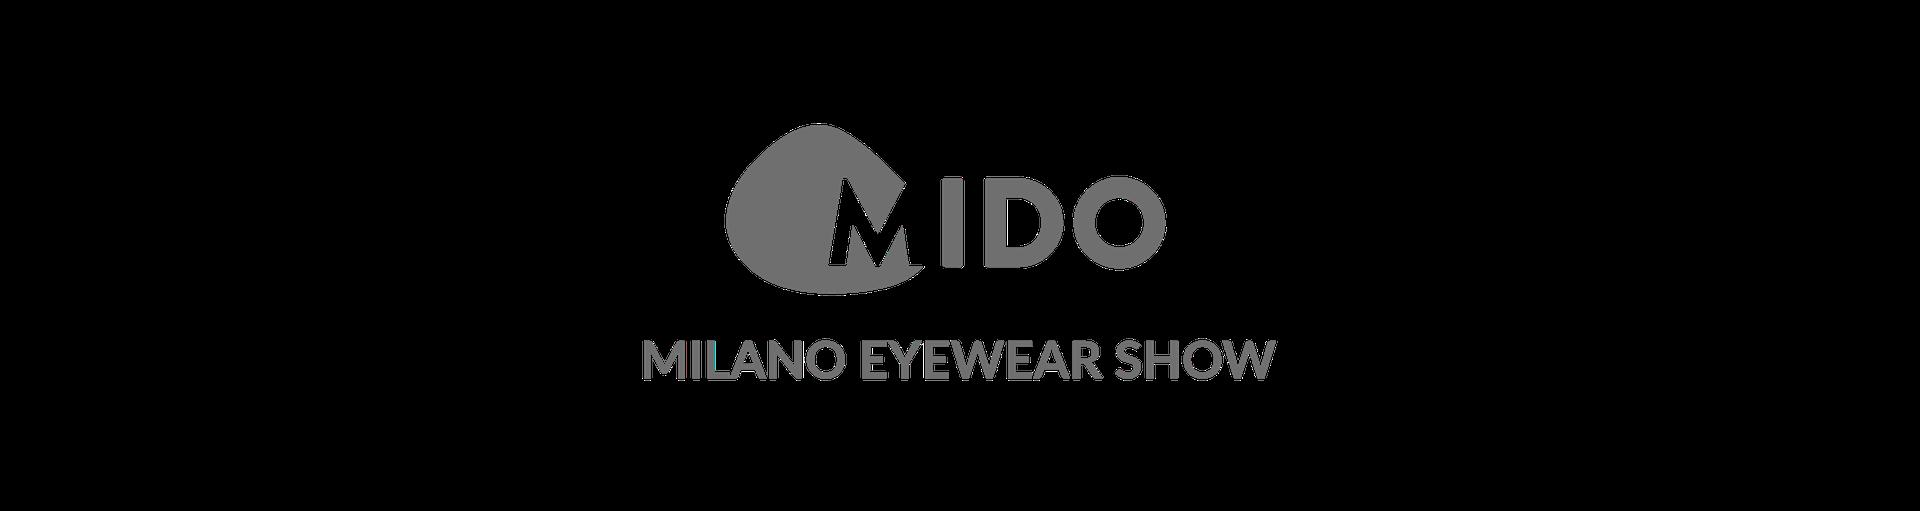 MIDO | Milano eyewear show